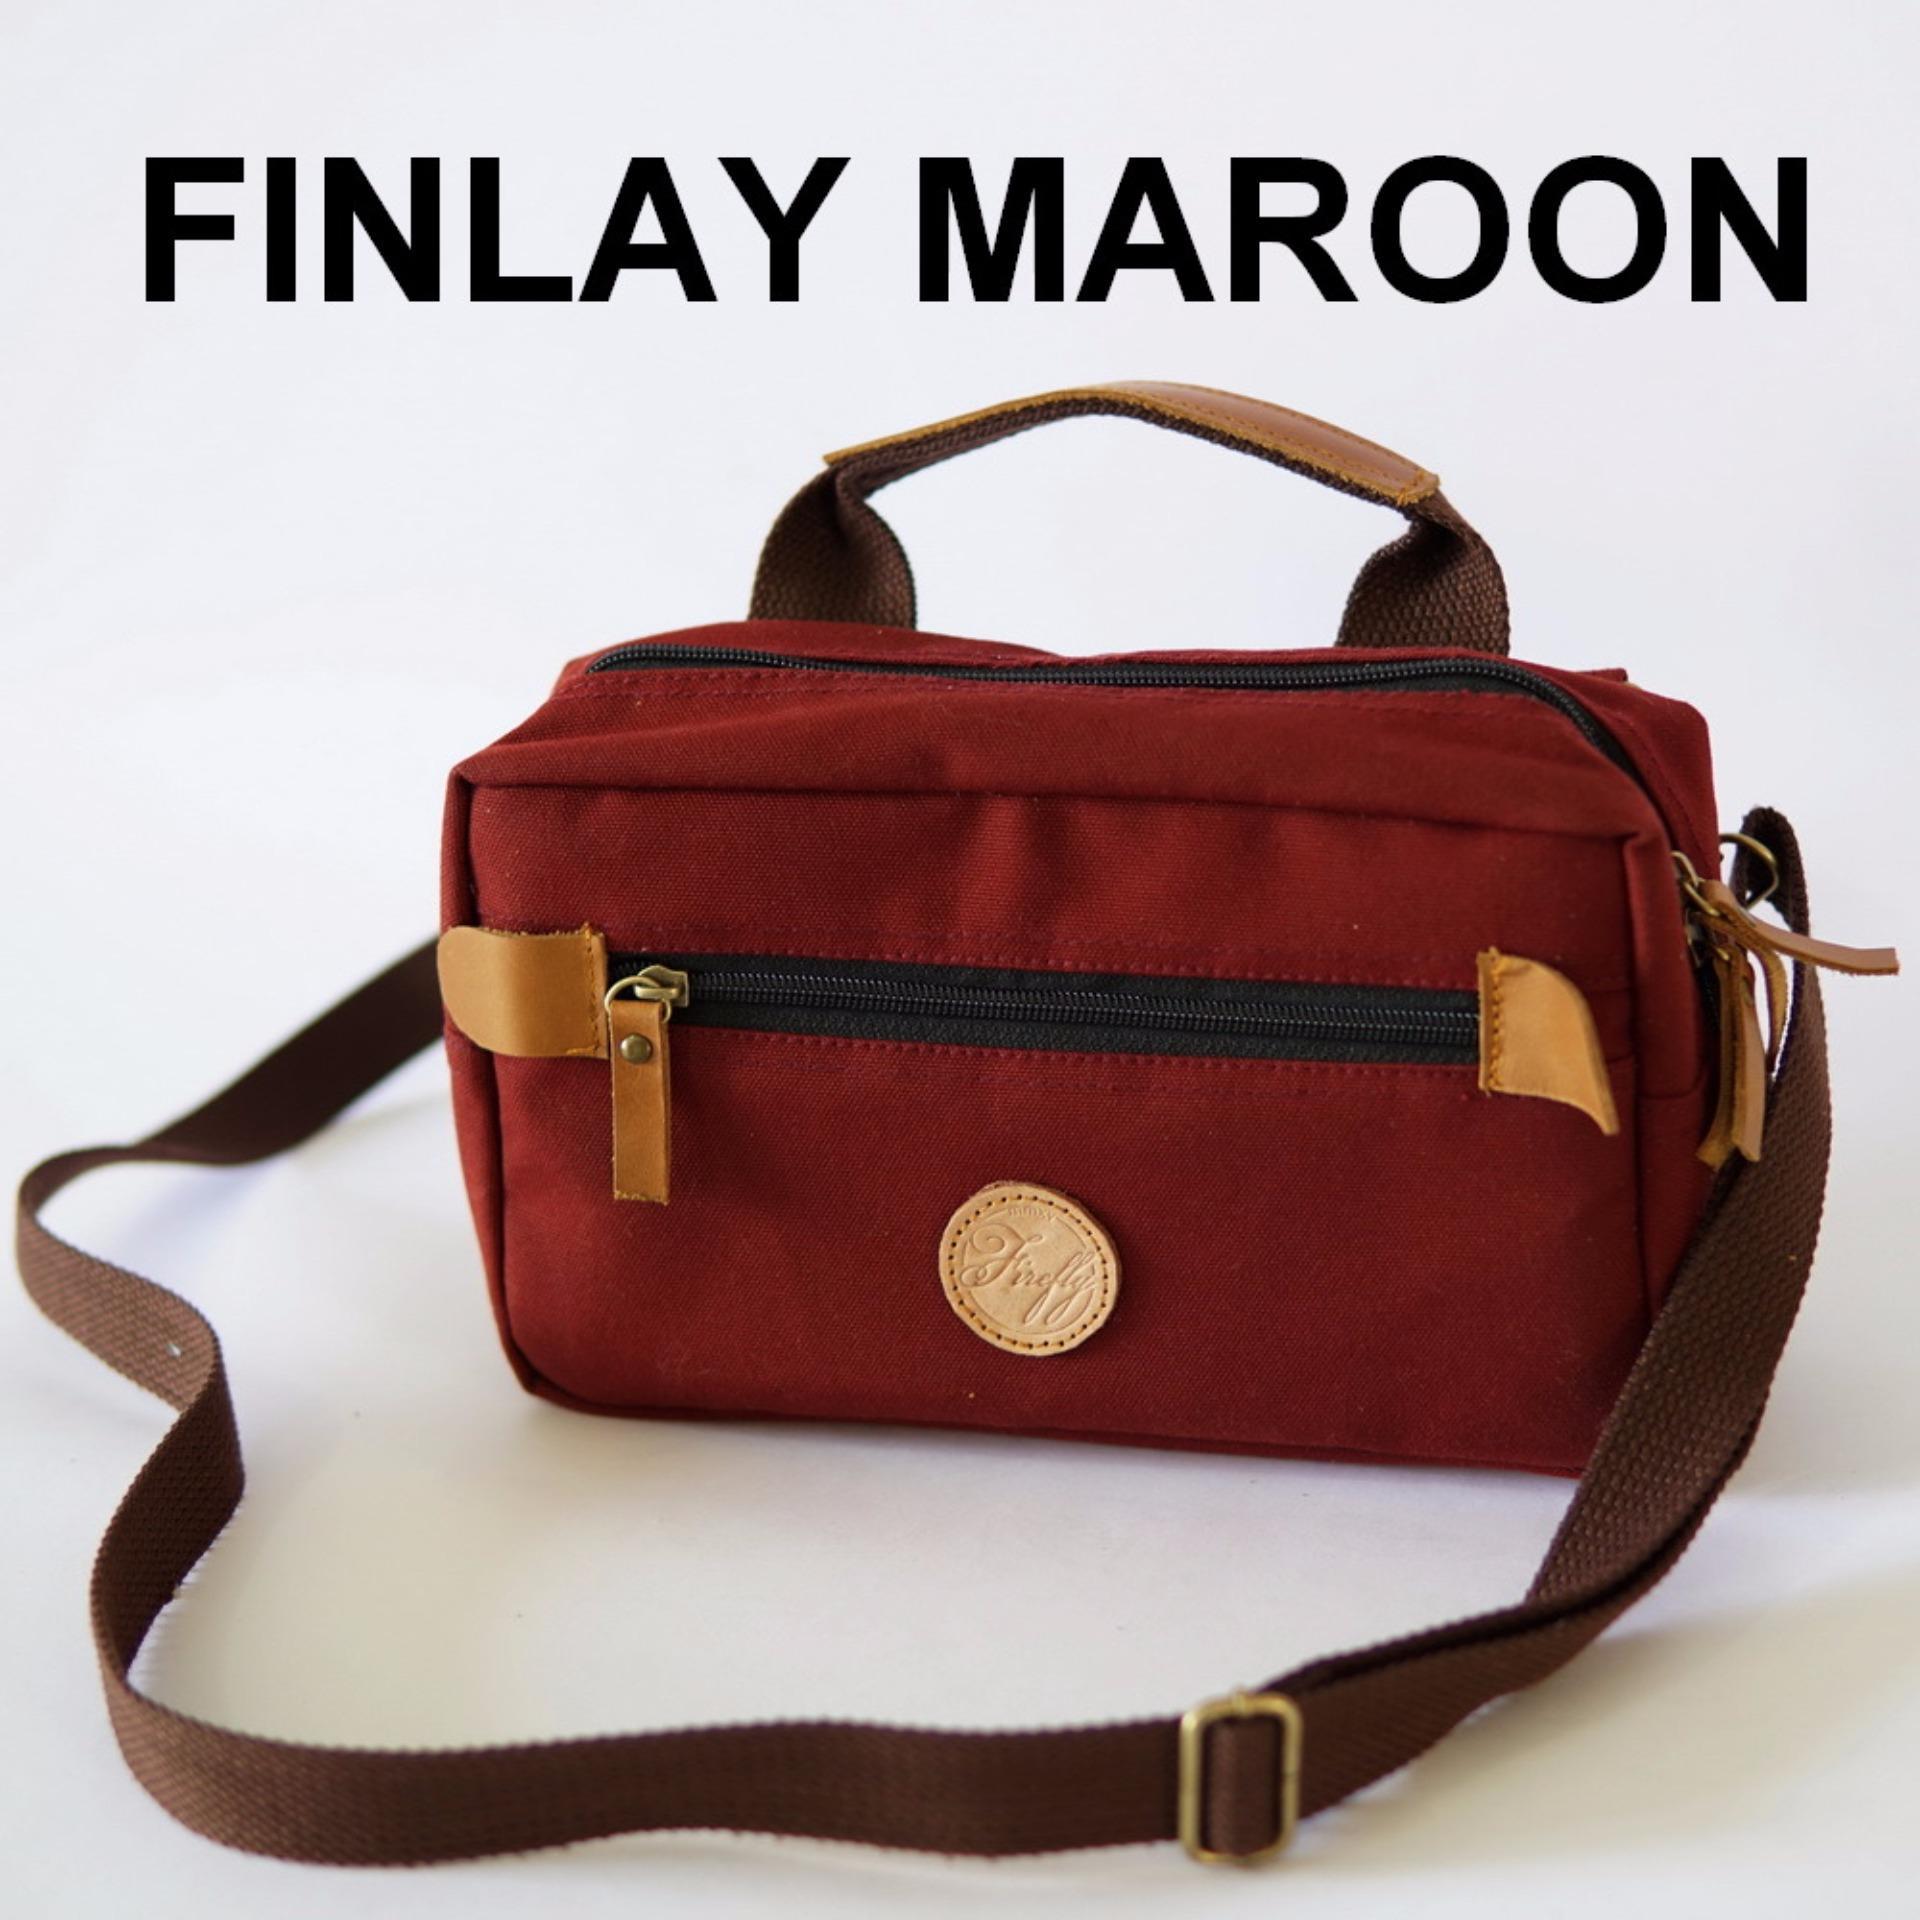 Beli Firefly Finlay Maroon Dopp Kit Lengkap